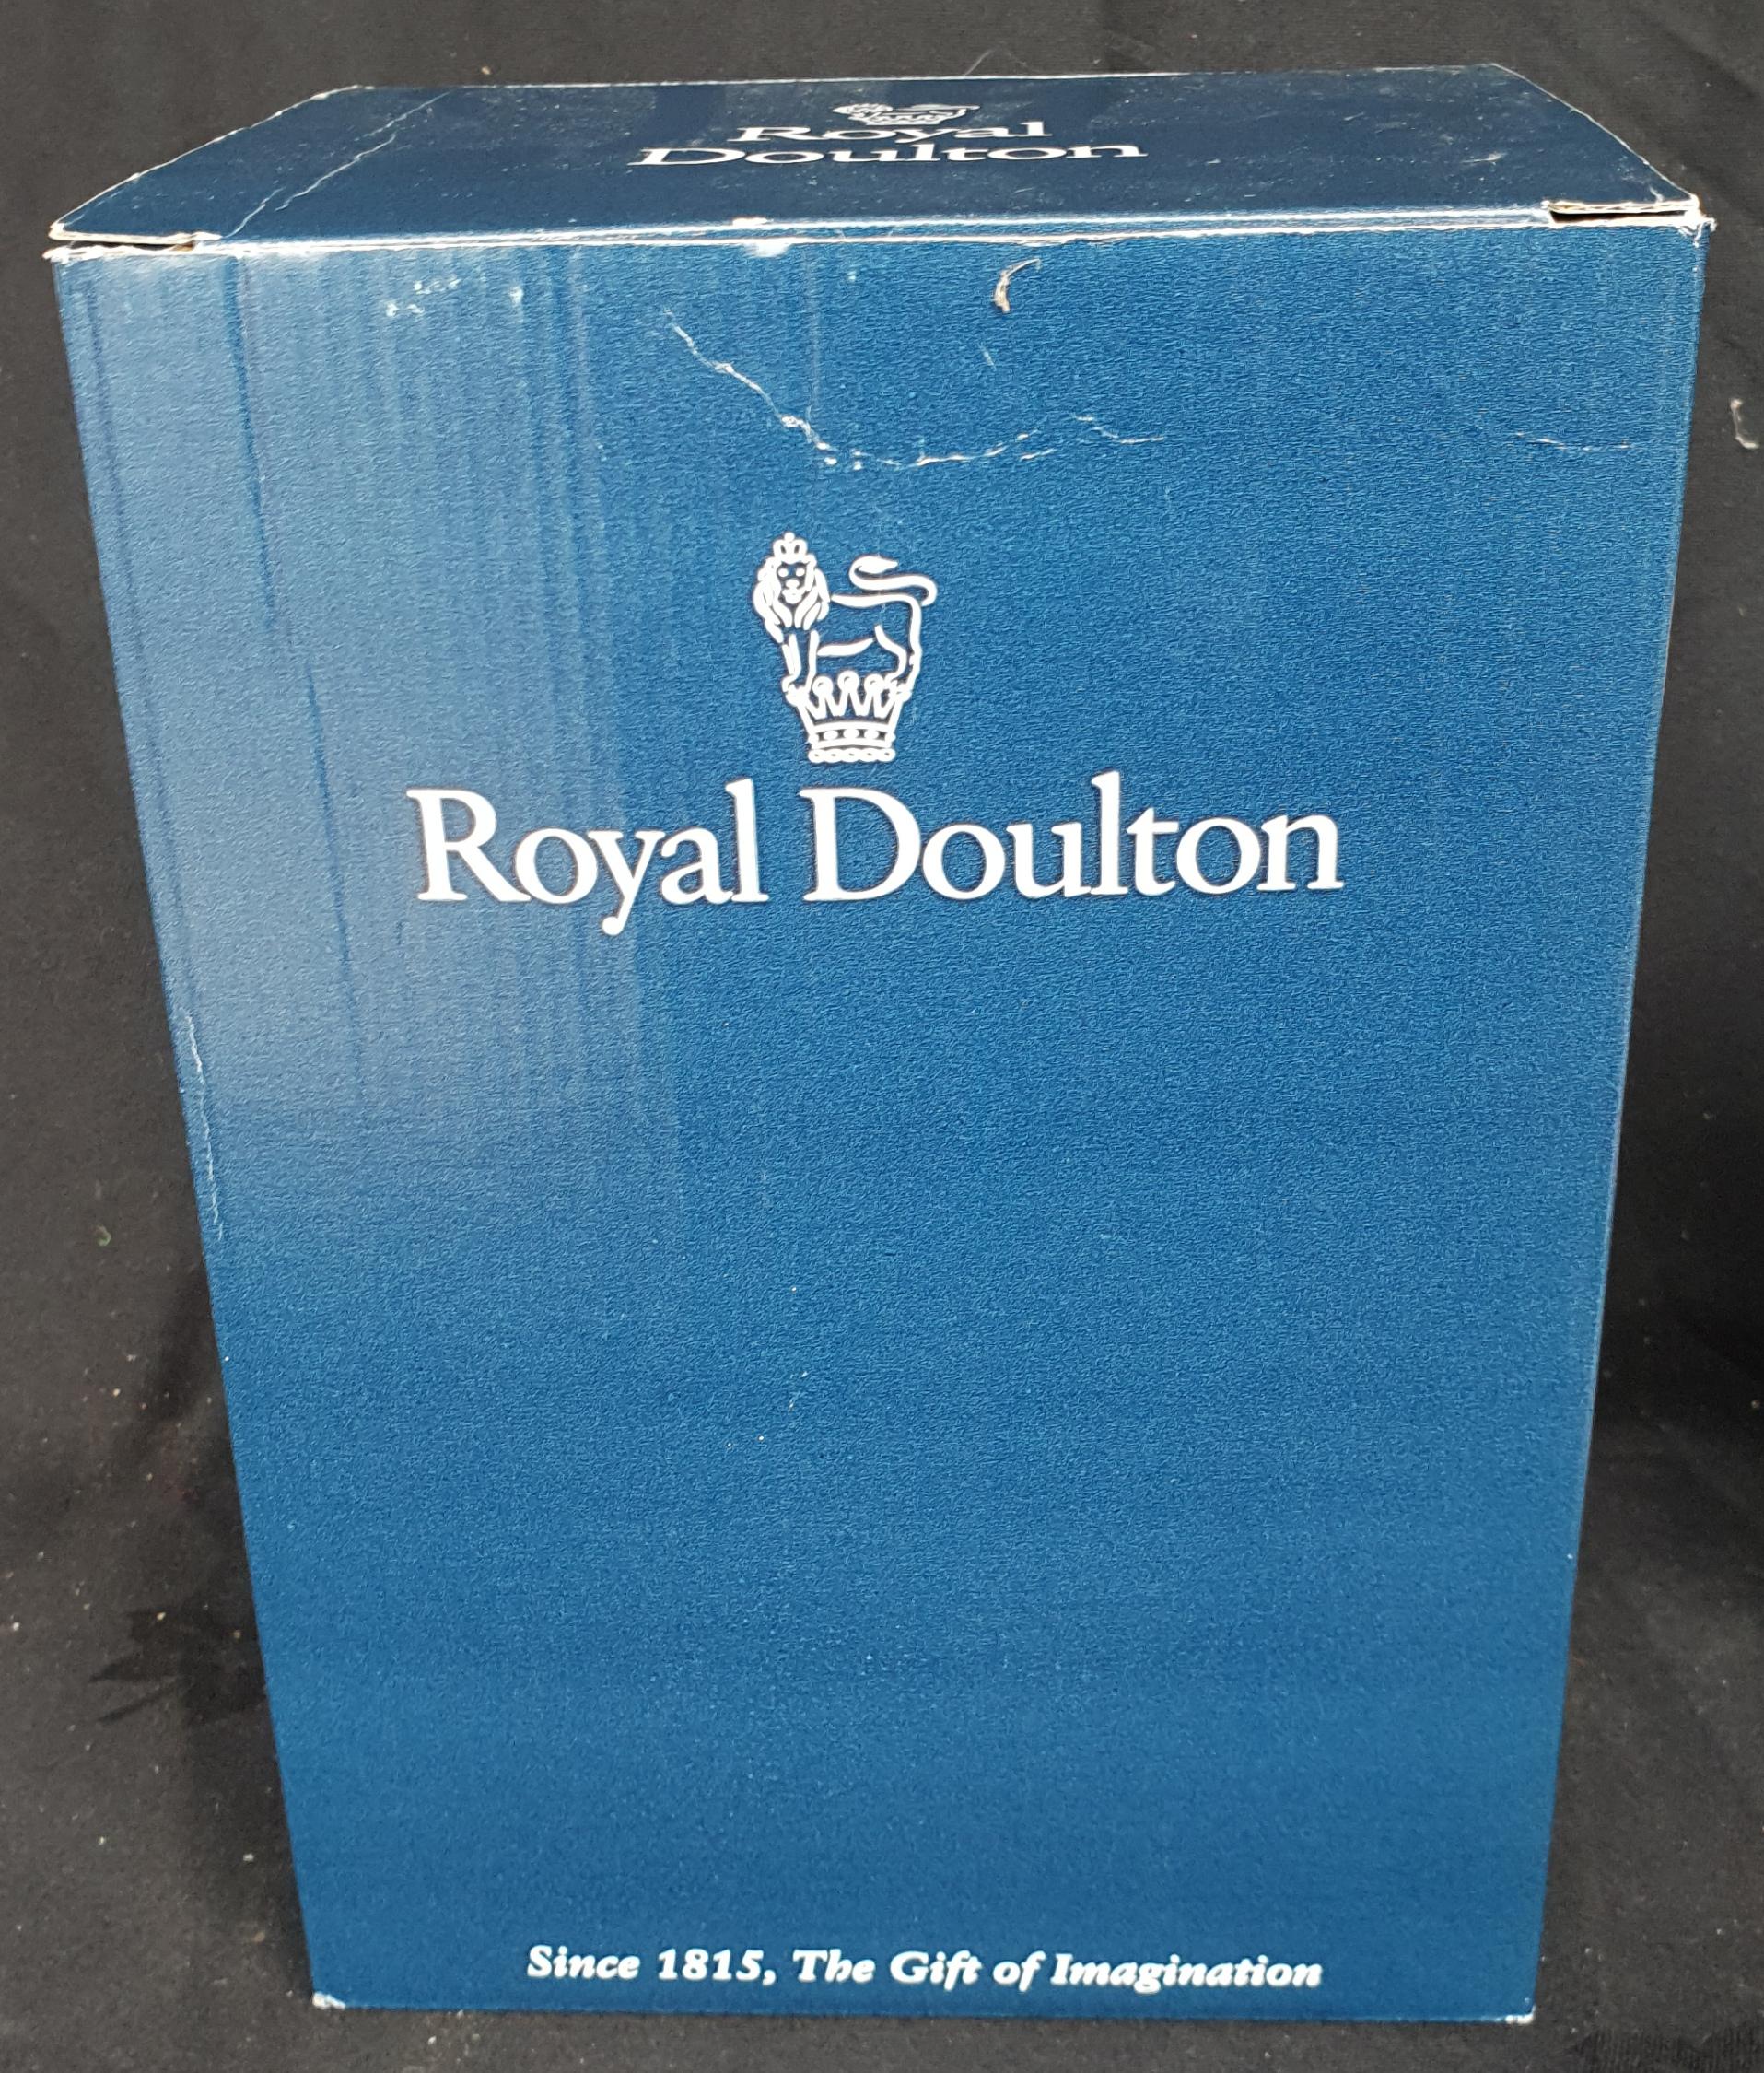 Vintage Limited Edition Royal Doulton Character Jug George Stephenson - Image 3 of 3